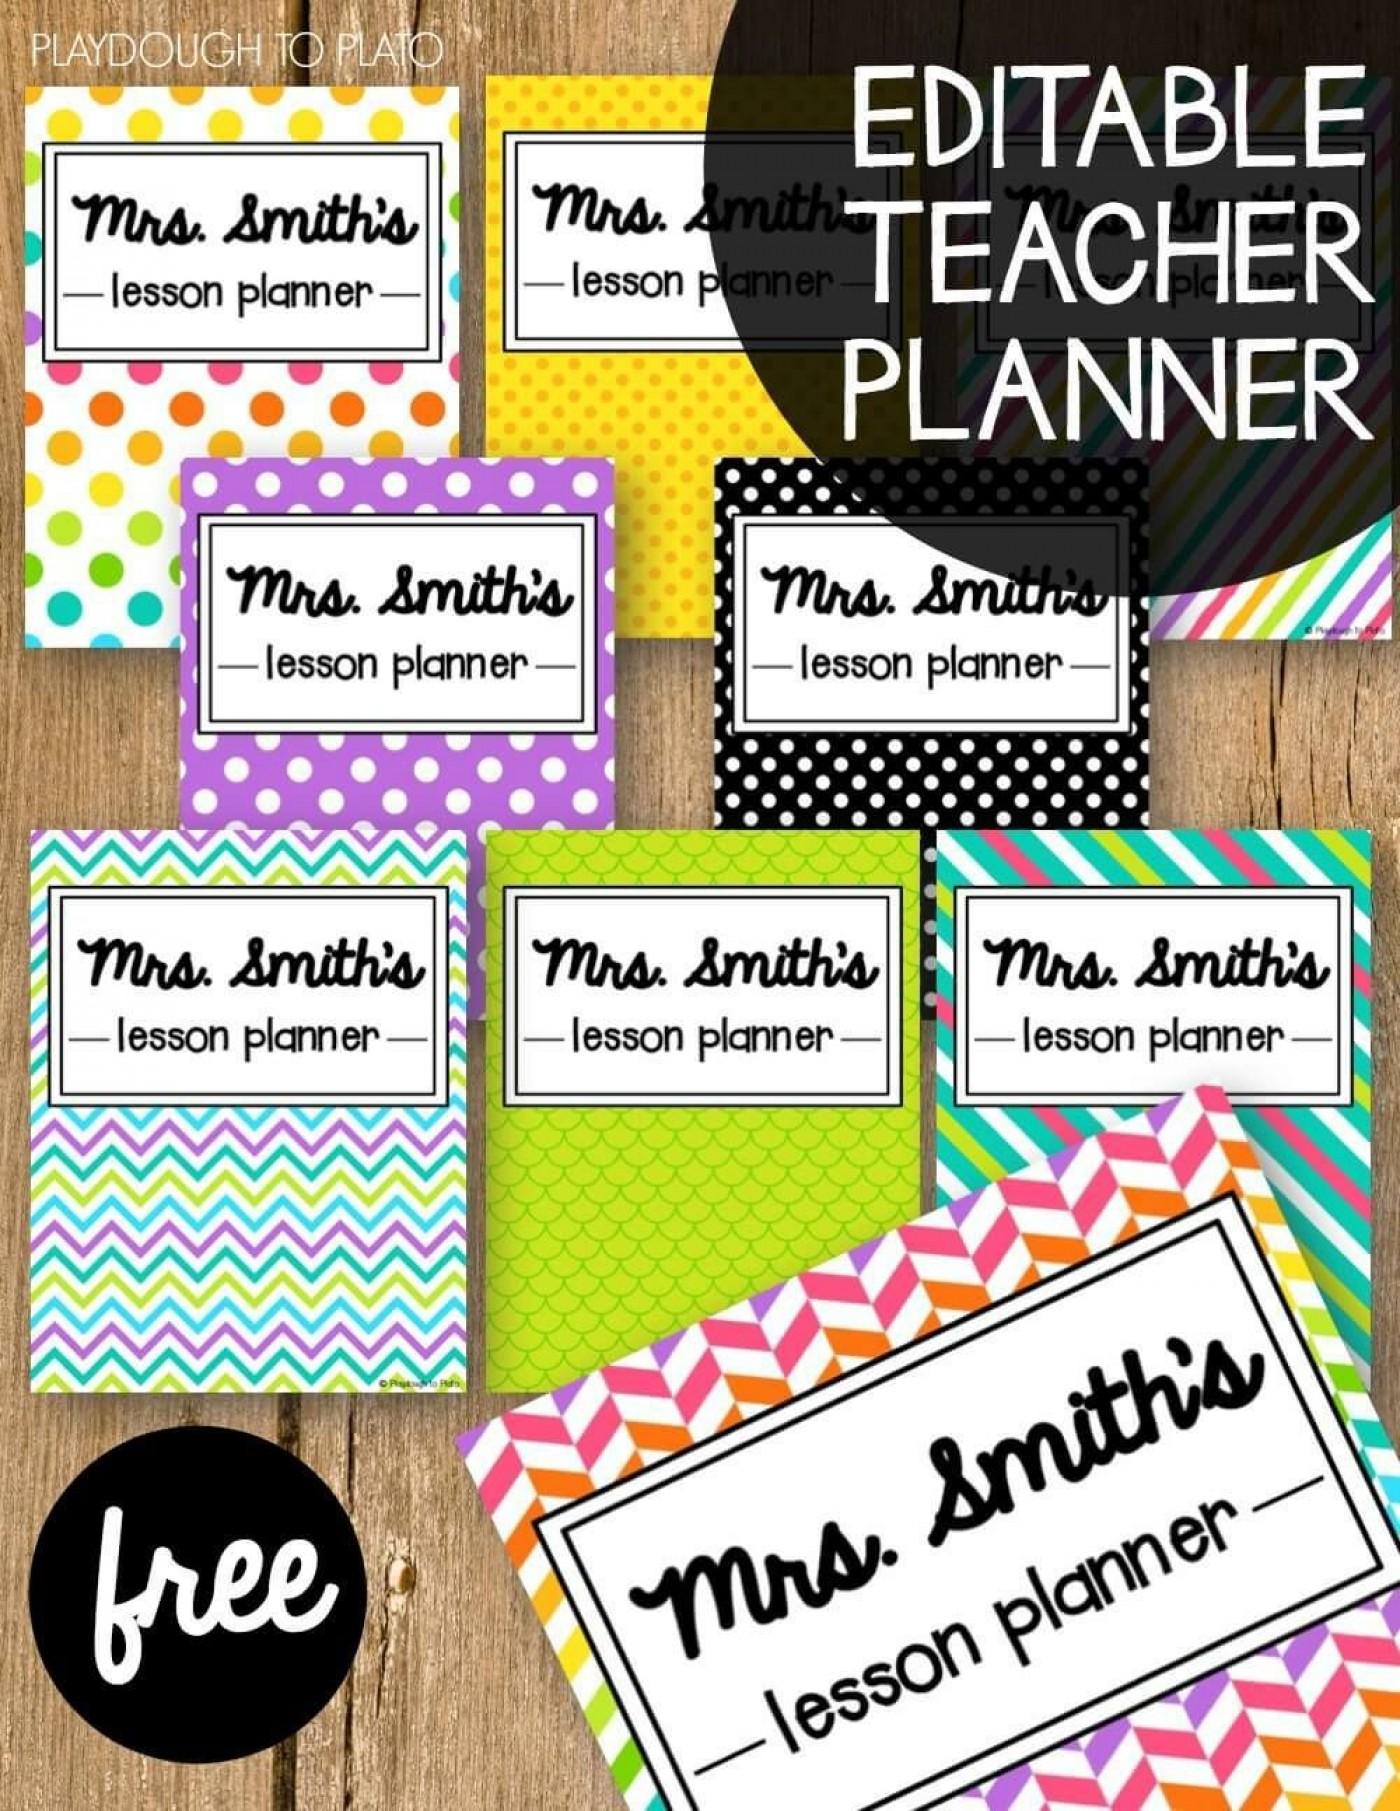 001 Simple Free Printable Teacher Binder Template Idea 1400